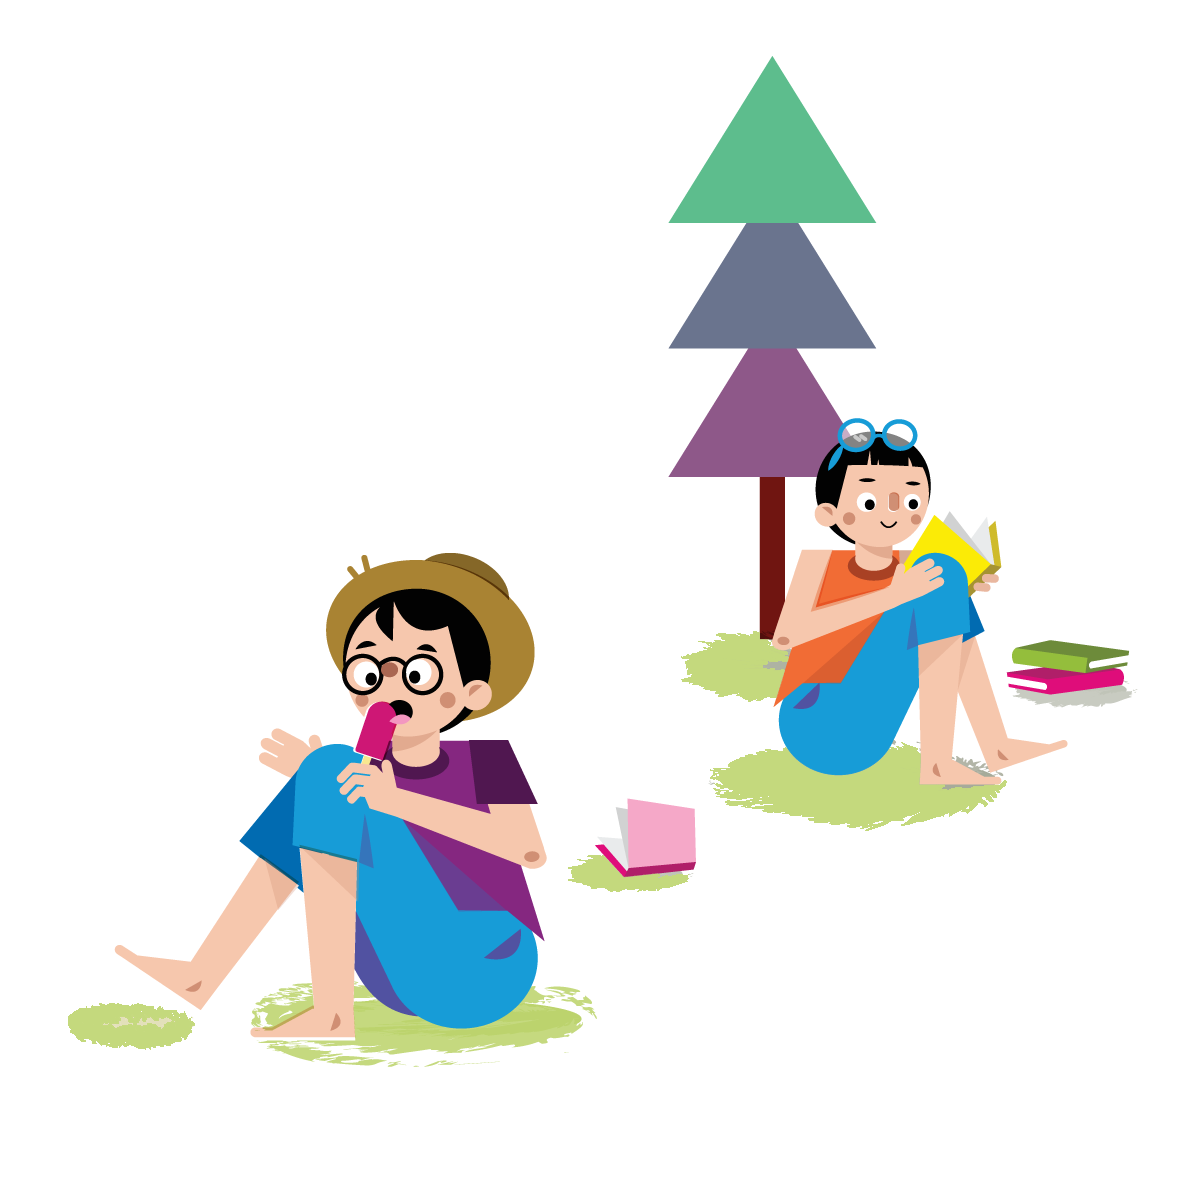 Camping boys - Vector Illustration © Emeline Barrea, All rights reserved